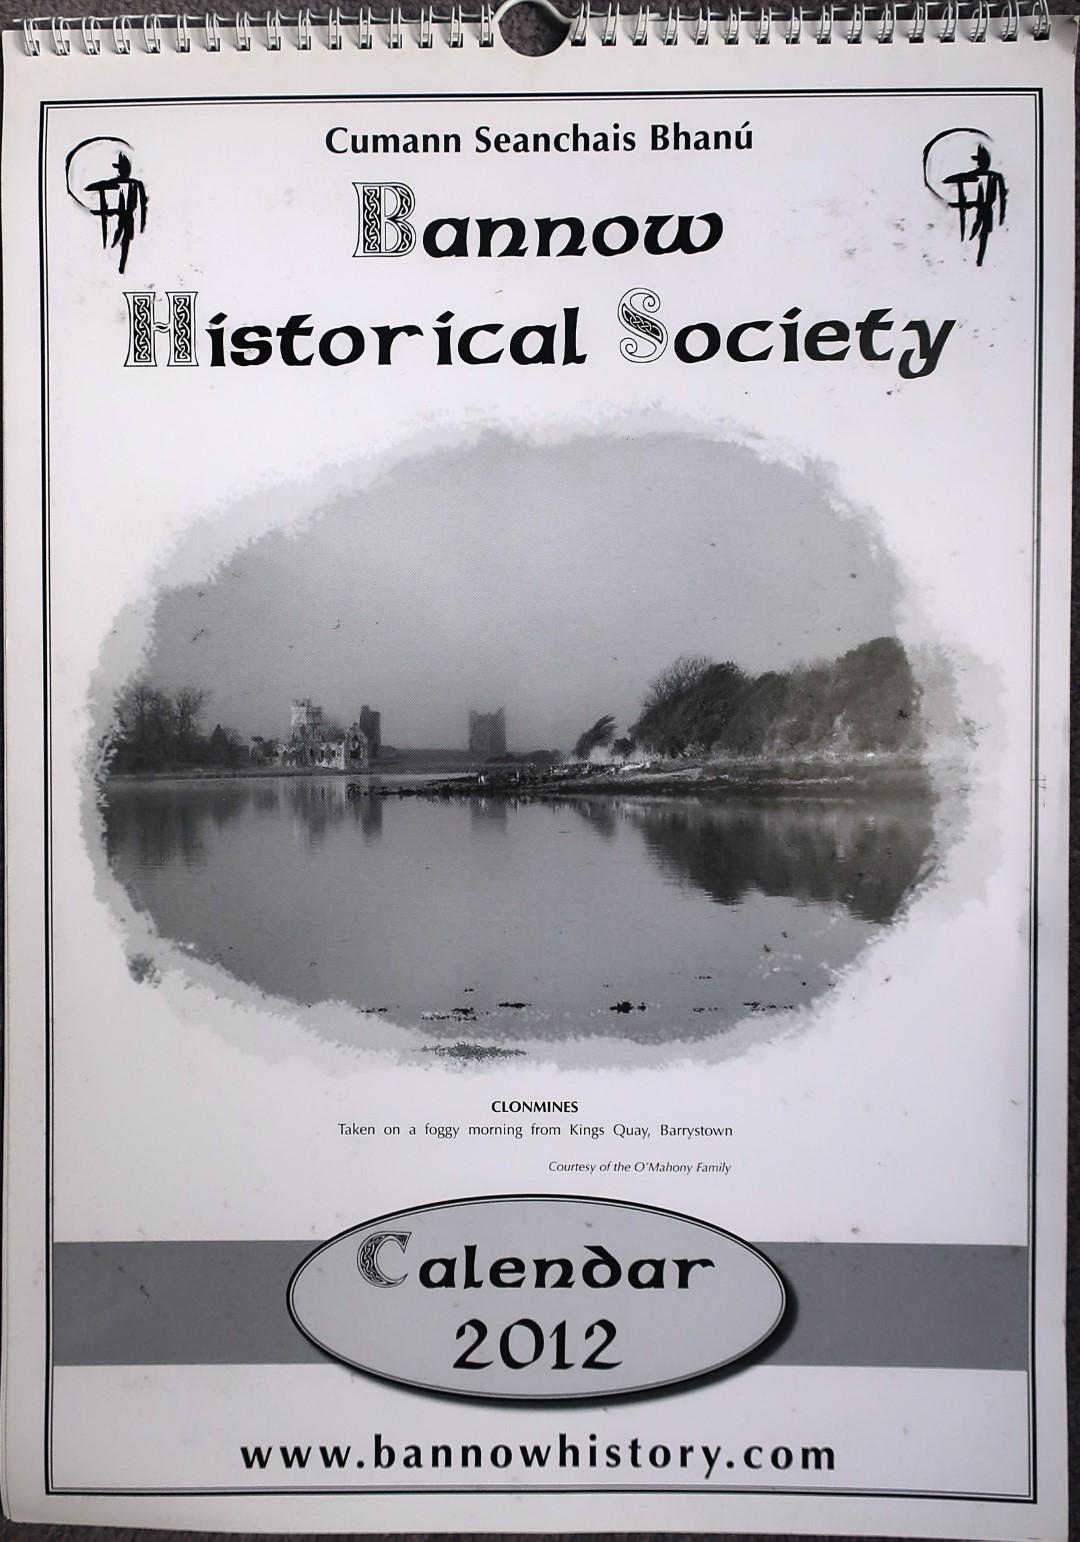 Bannow Historical Society Calendar 2012